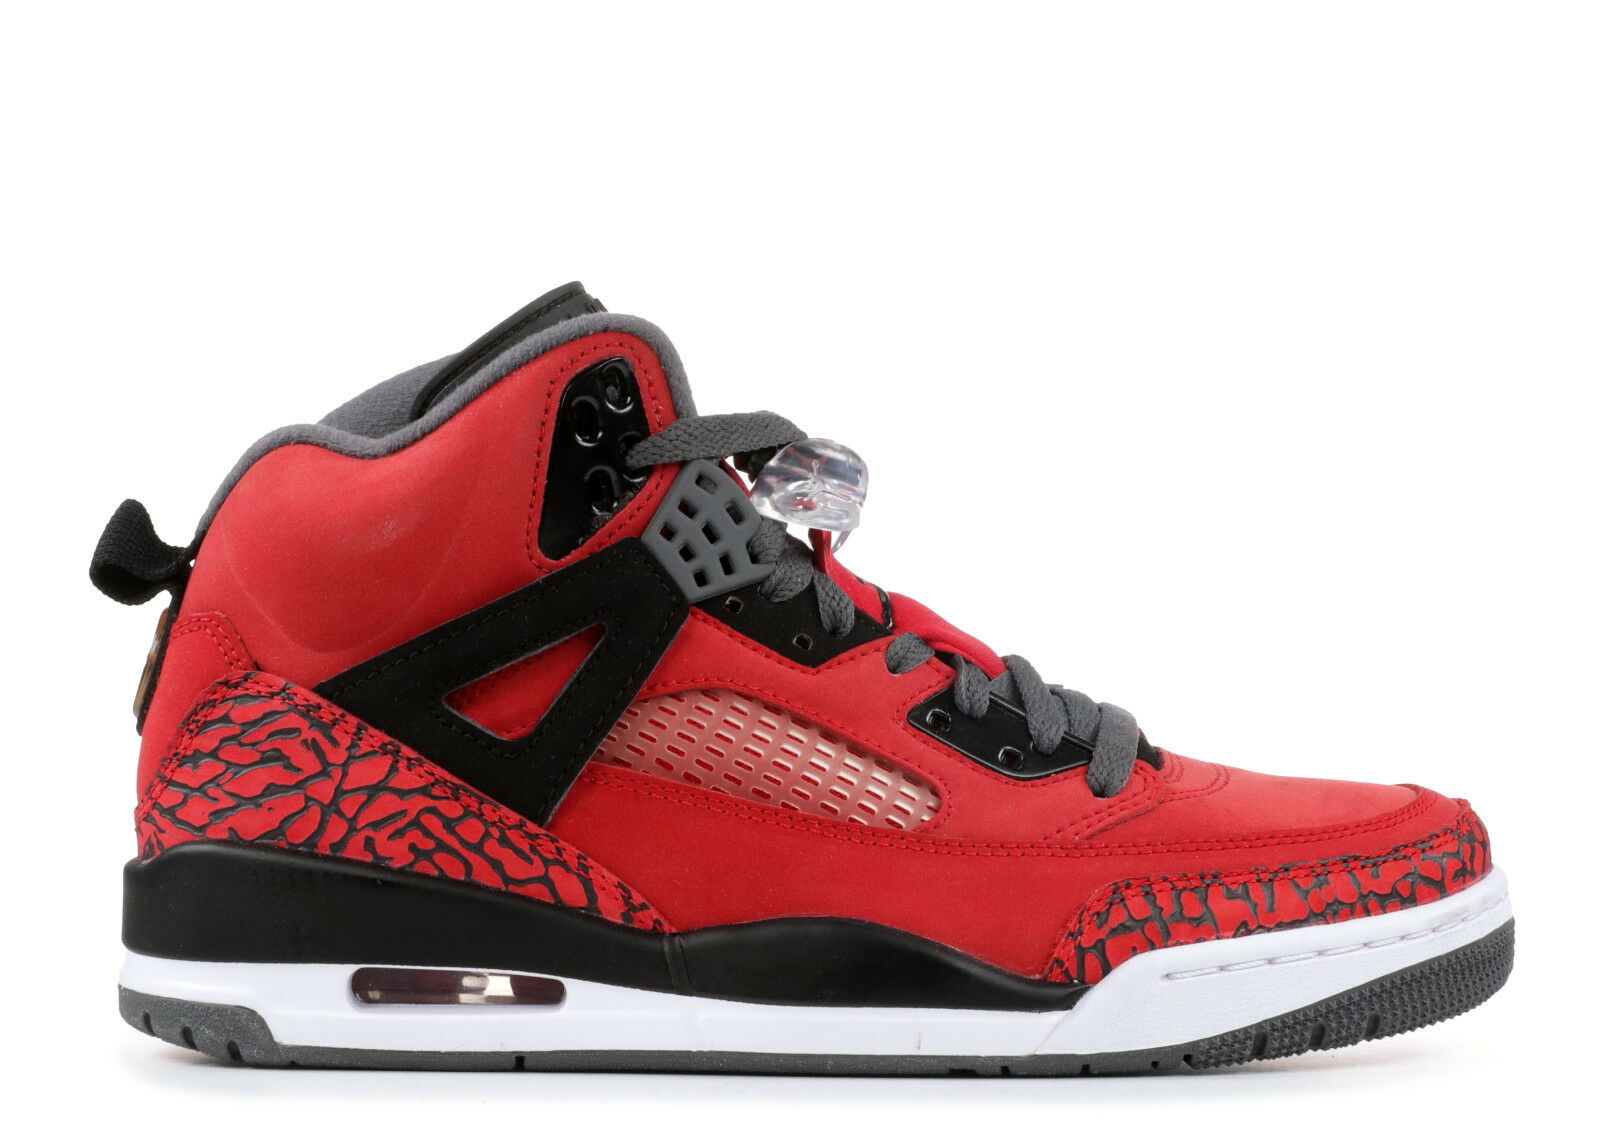 Nike air jordan spizike toro bravo fuoco rosso dimensioni 315371-601 1 2 3 4 5 6